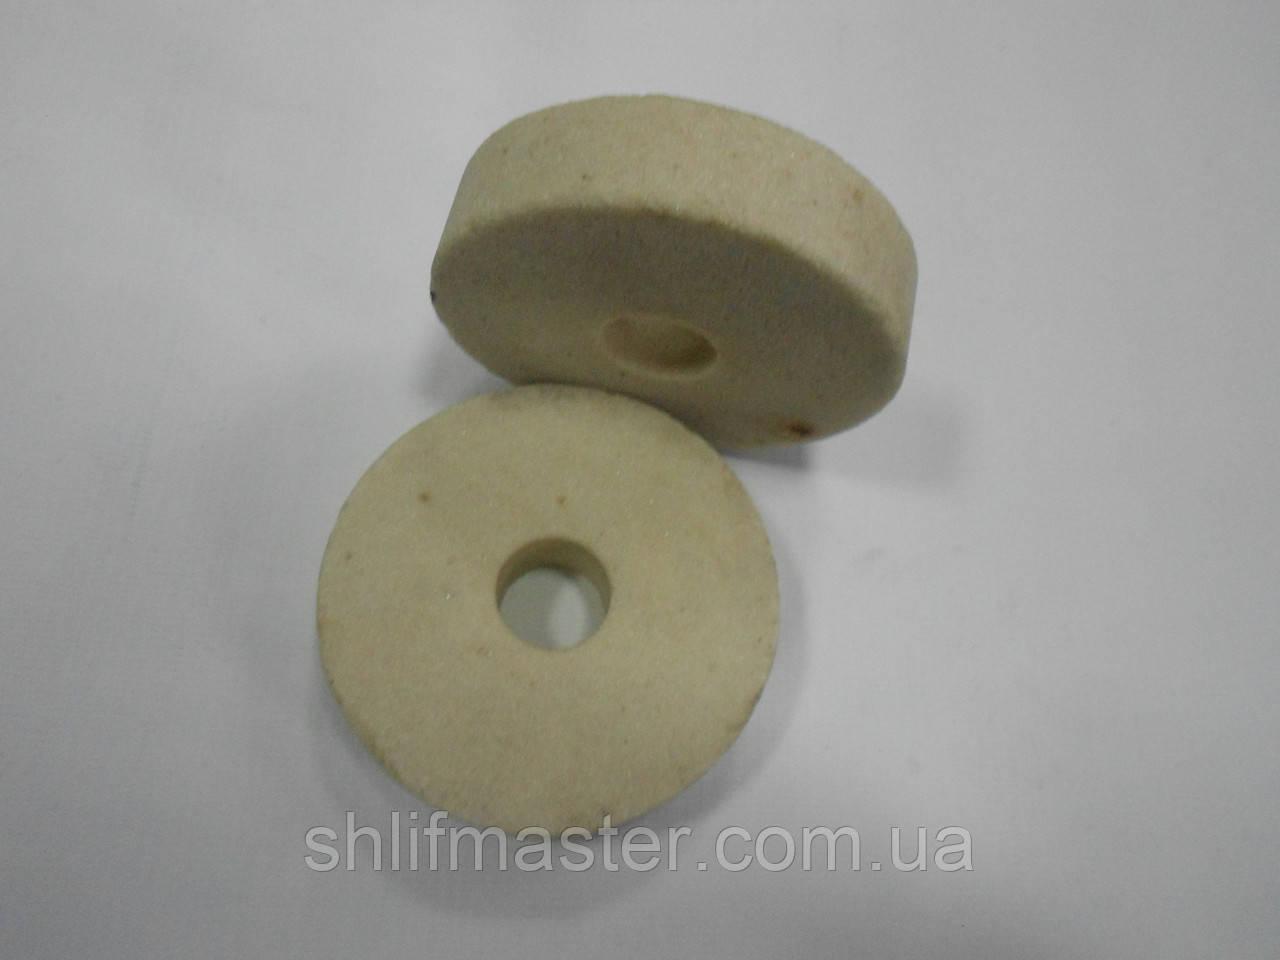 Абразивный круг шлифовальный (электрокорунд белый) 25А ПП 80Х50Х20 16-25 С, СМ, СТ